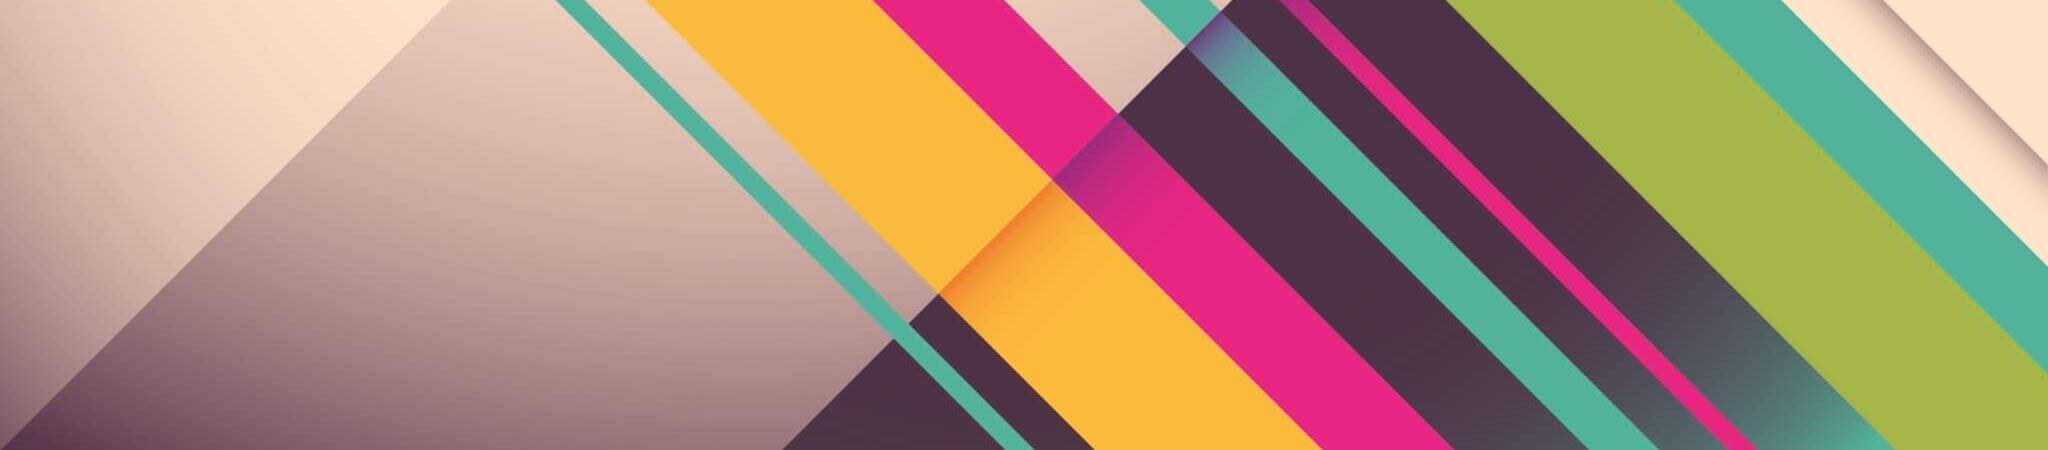 Image of big colourful background